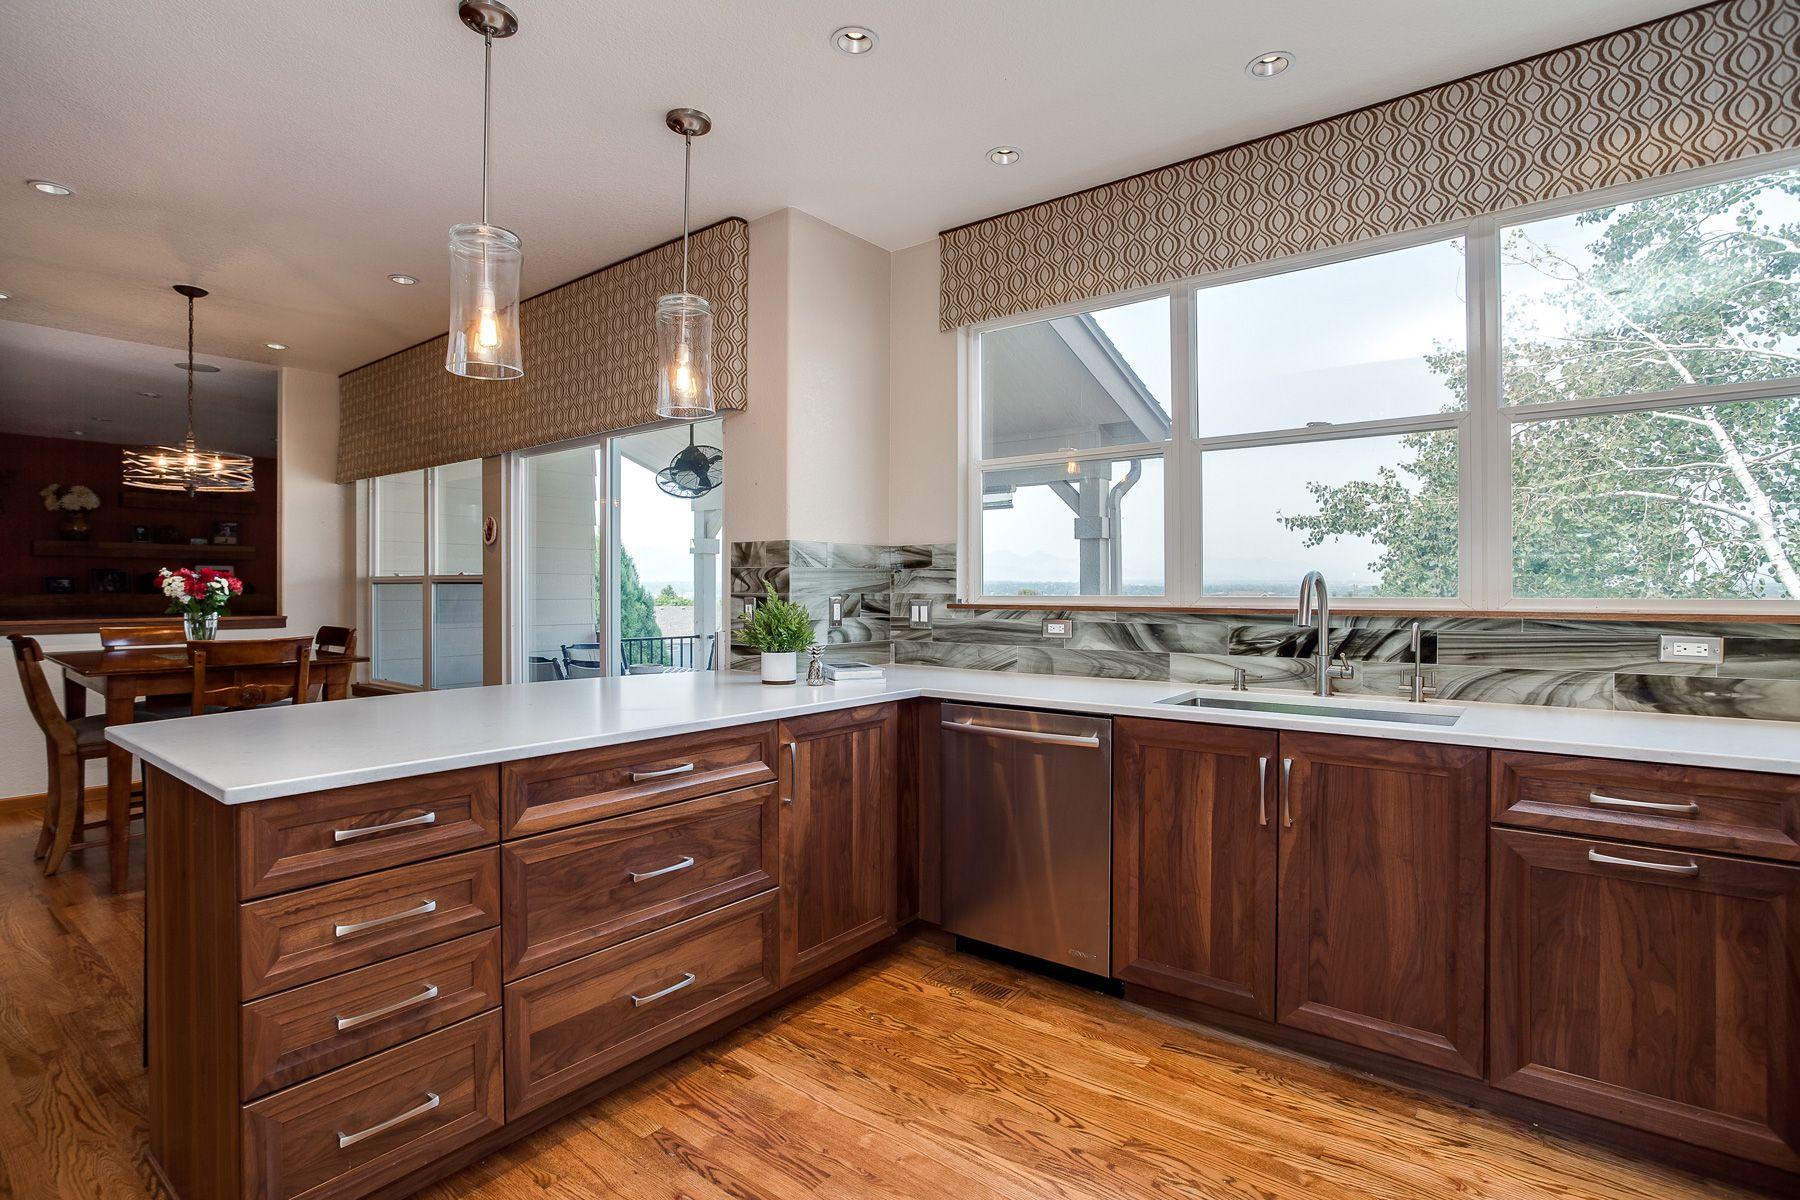 Beautiful Transitional Modern Kitchen Remodel Jm Kitchen And Bath Https Www Jmwoodworks Com B Modern Kitchen Remodel Shaker Kitchen Cabinets Modern Kitchen